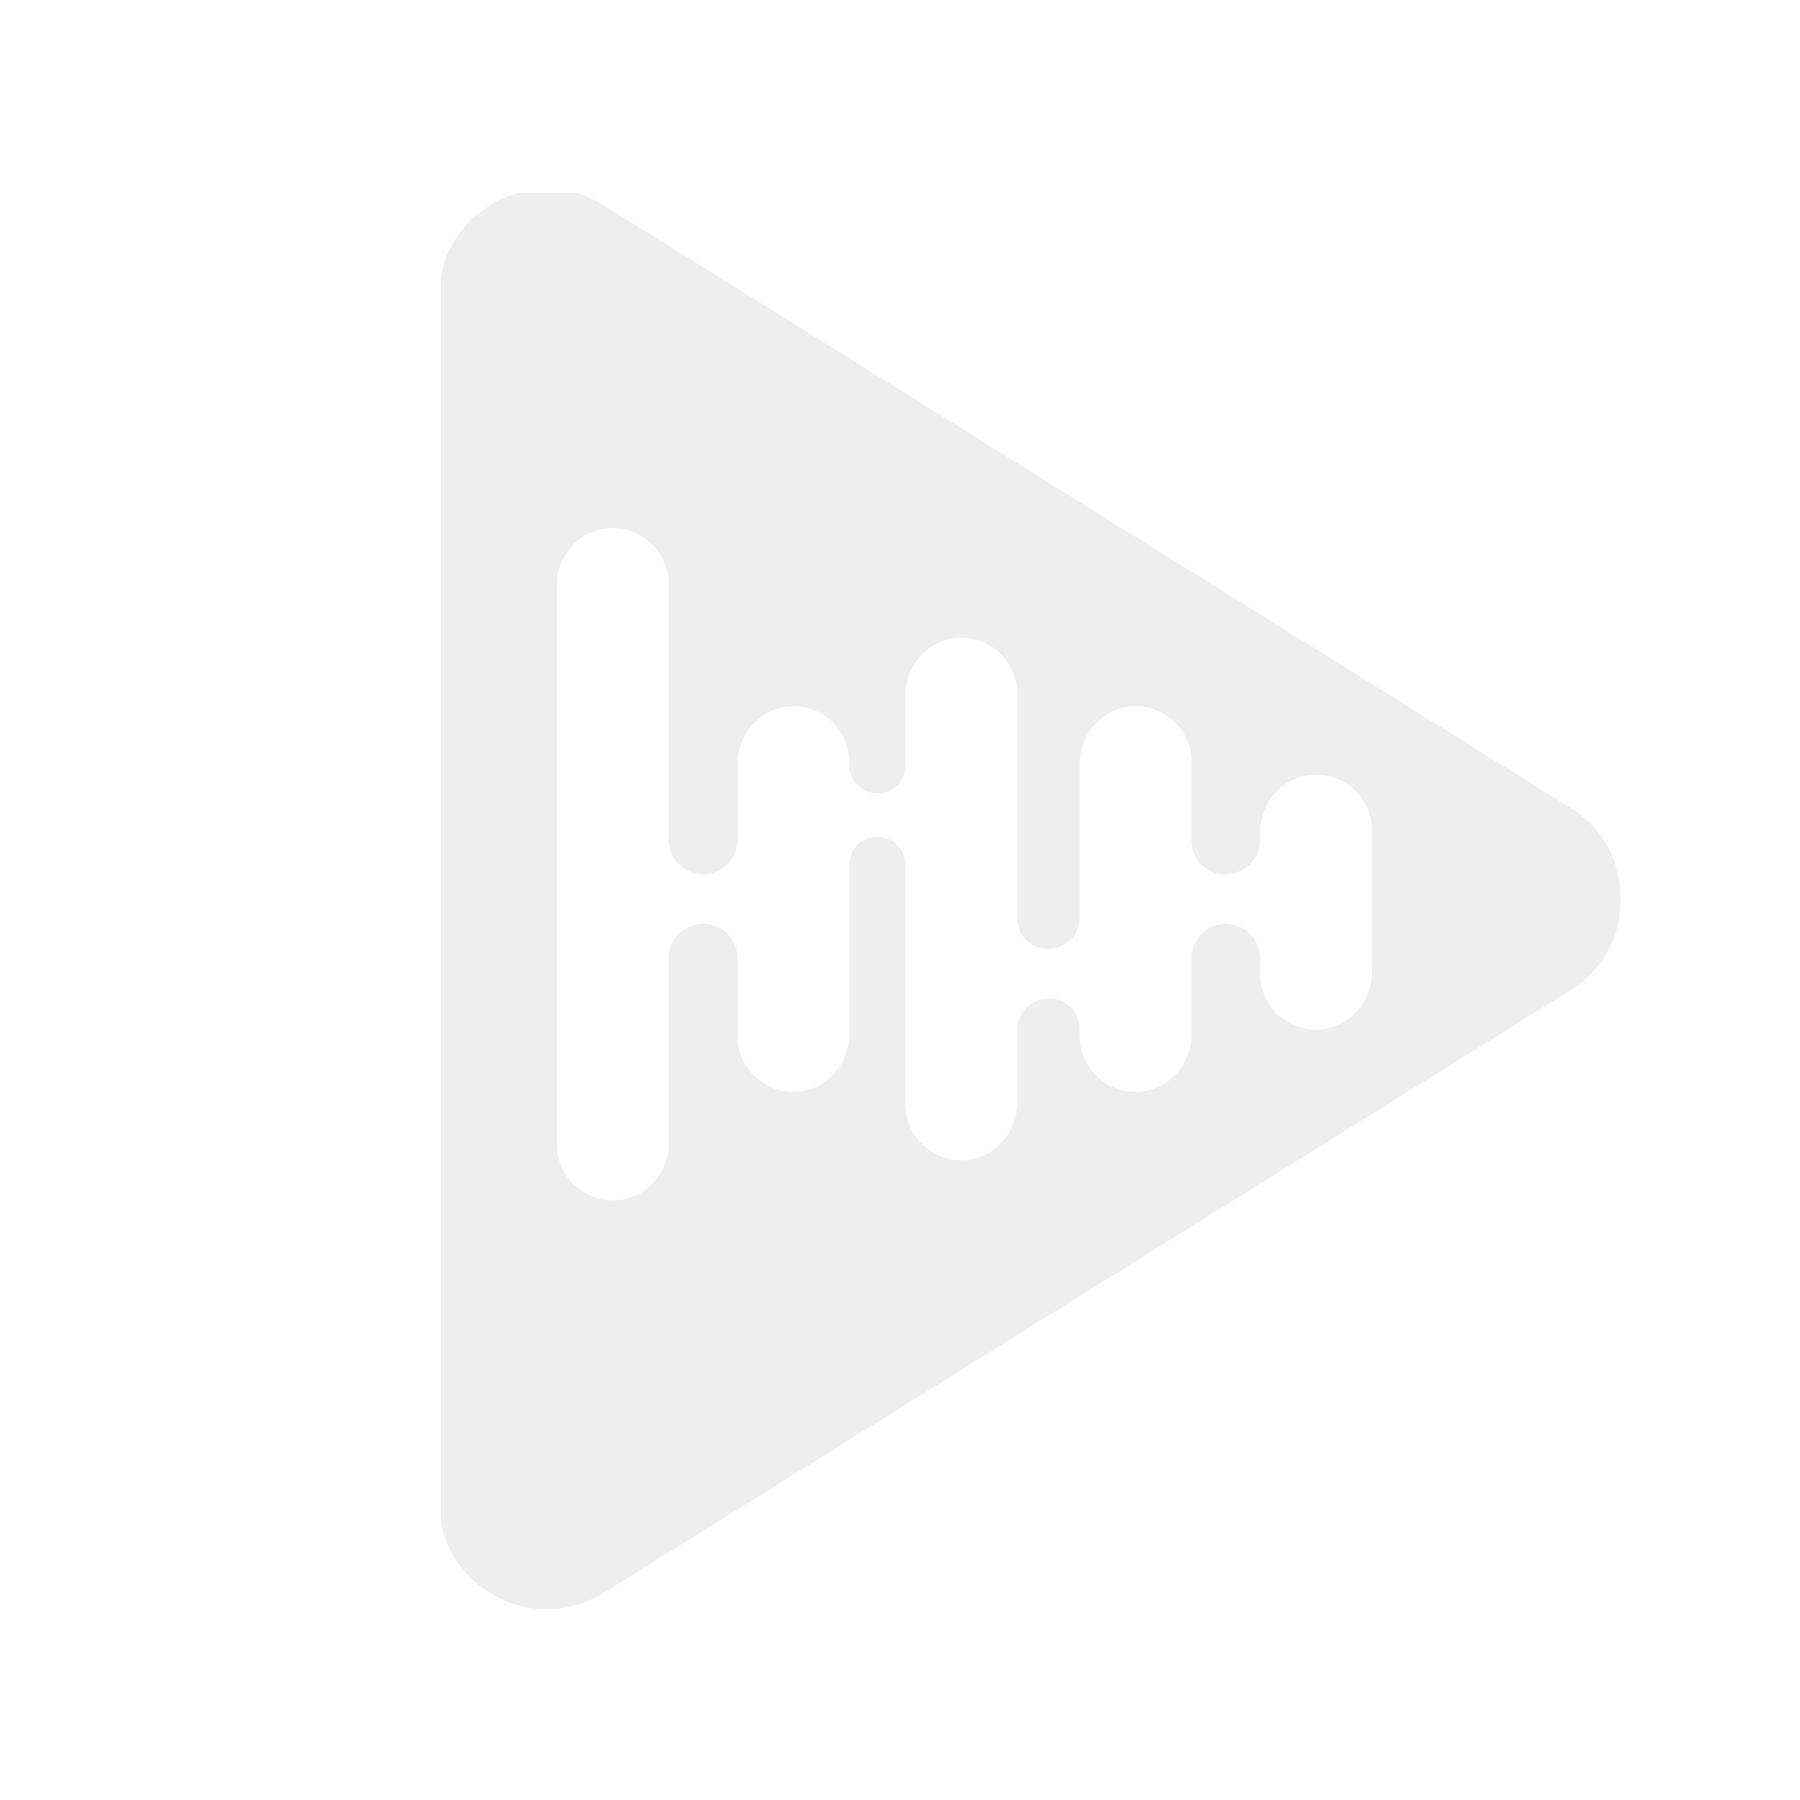 Speedsignal B-3474780-1